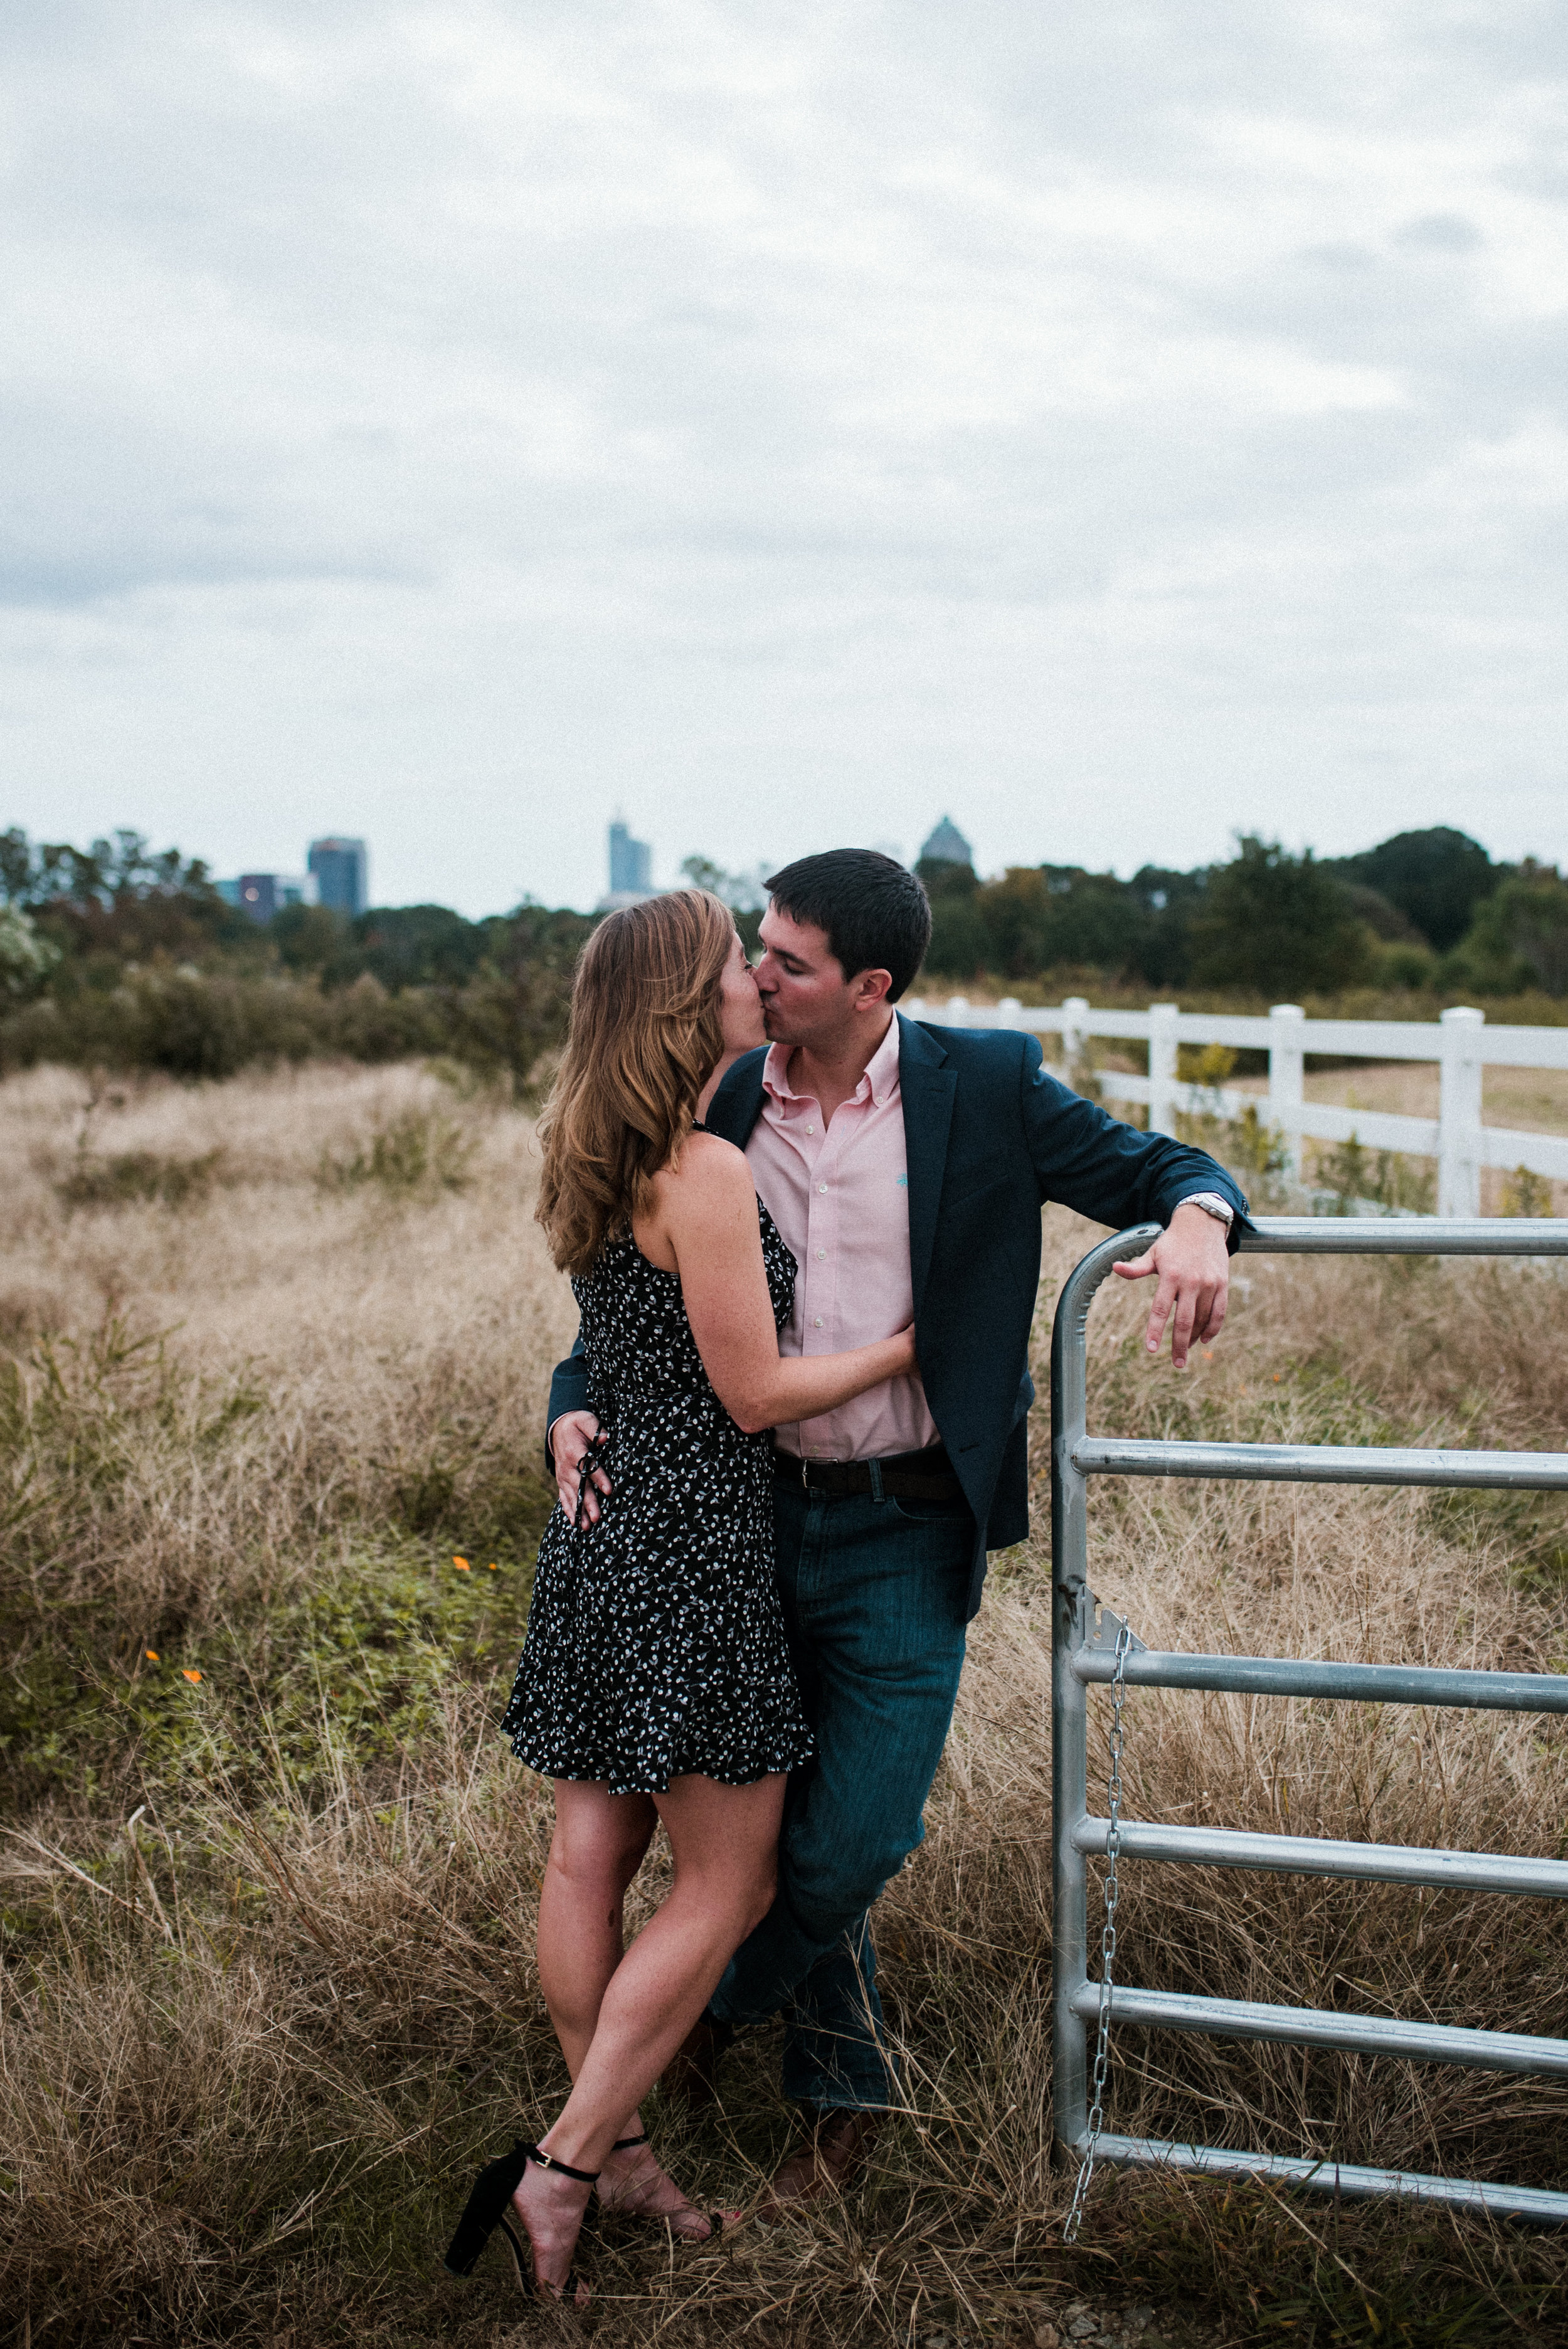 raleigh photographer - raleigh engagement - dorthea dix park - dorthea dix engagement